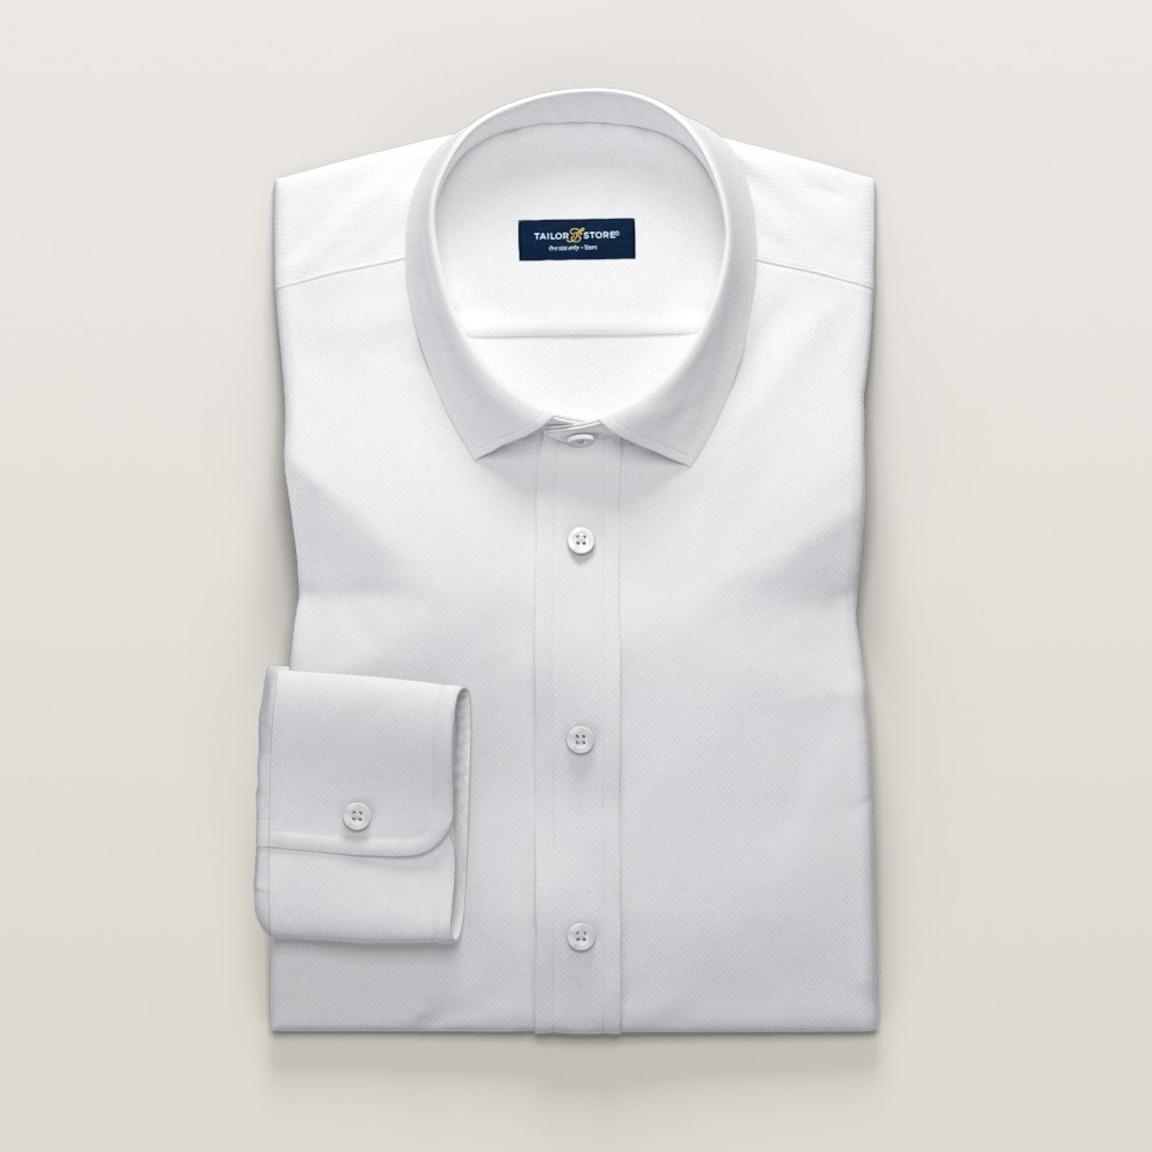 Business-Hemd aus weißem Ratière-Gewebe